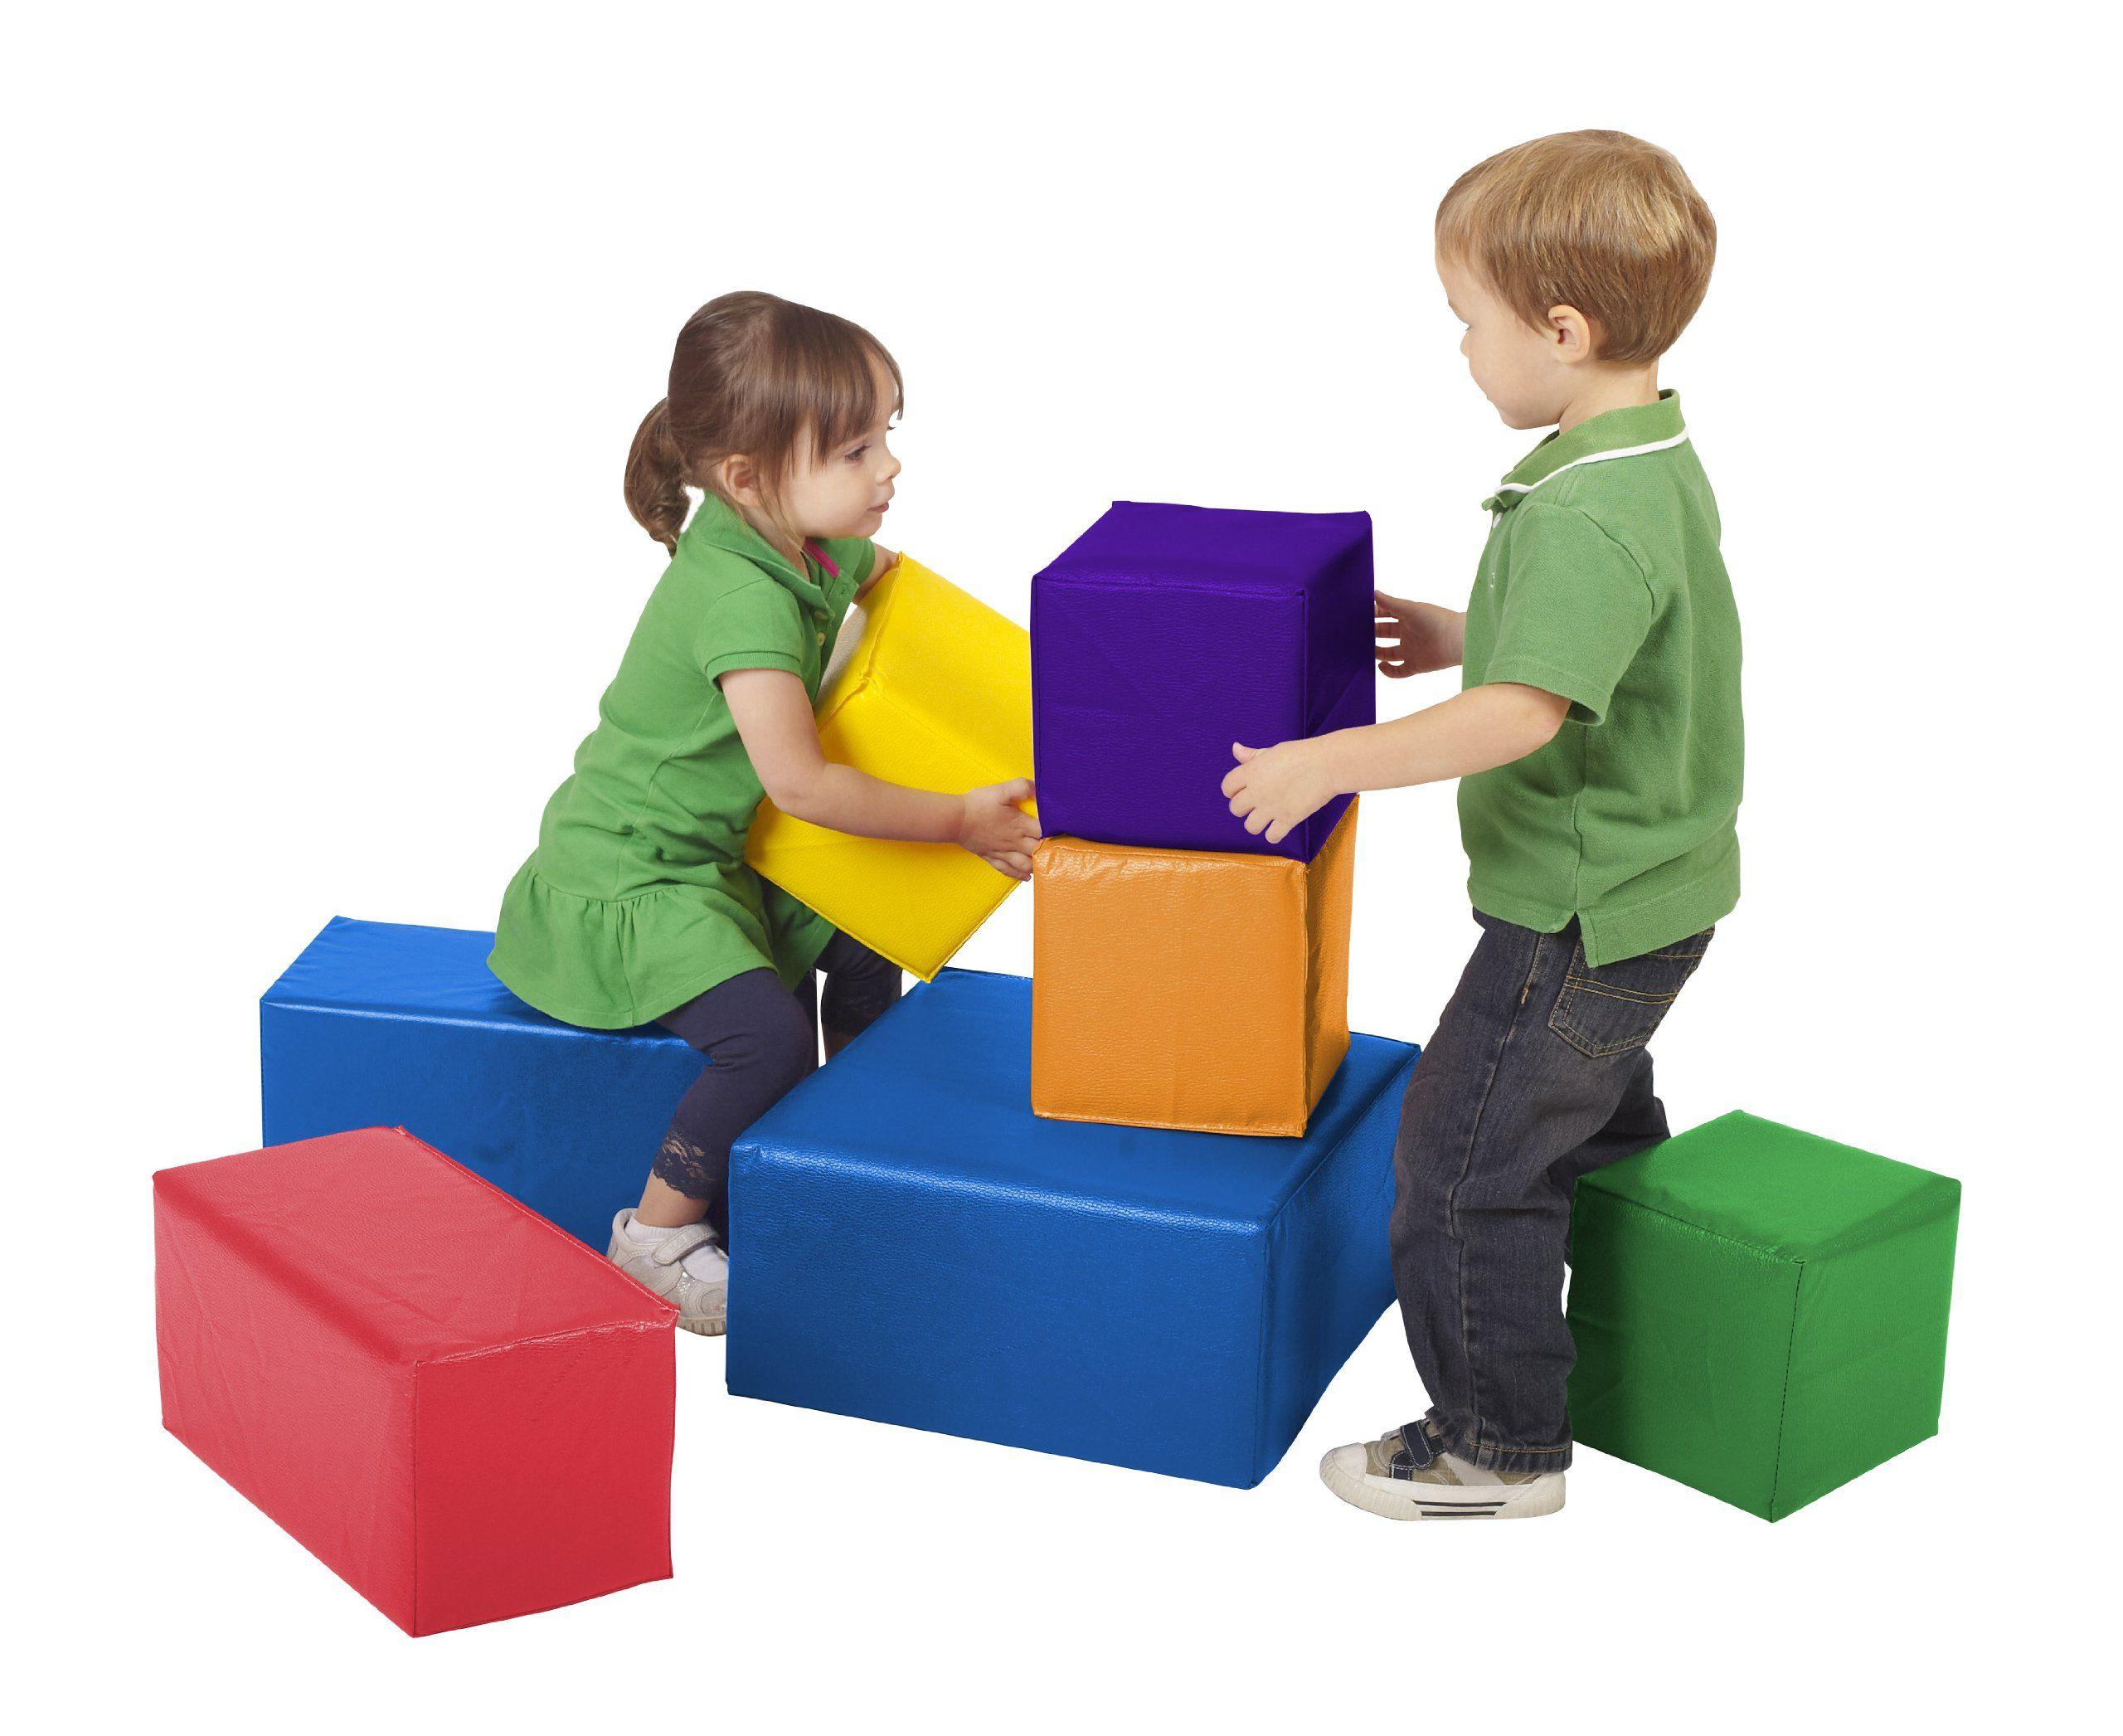 Lila sidney ecr4kids softzone foam big blocks 7